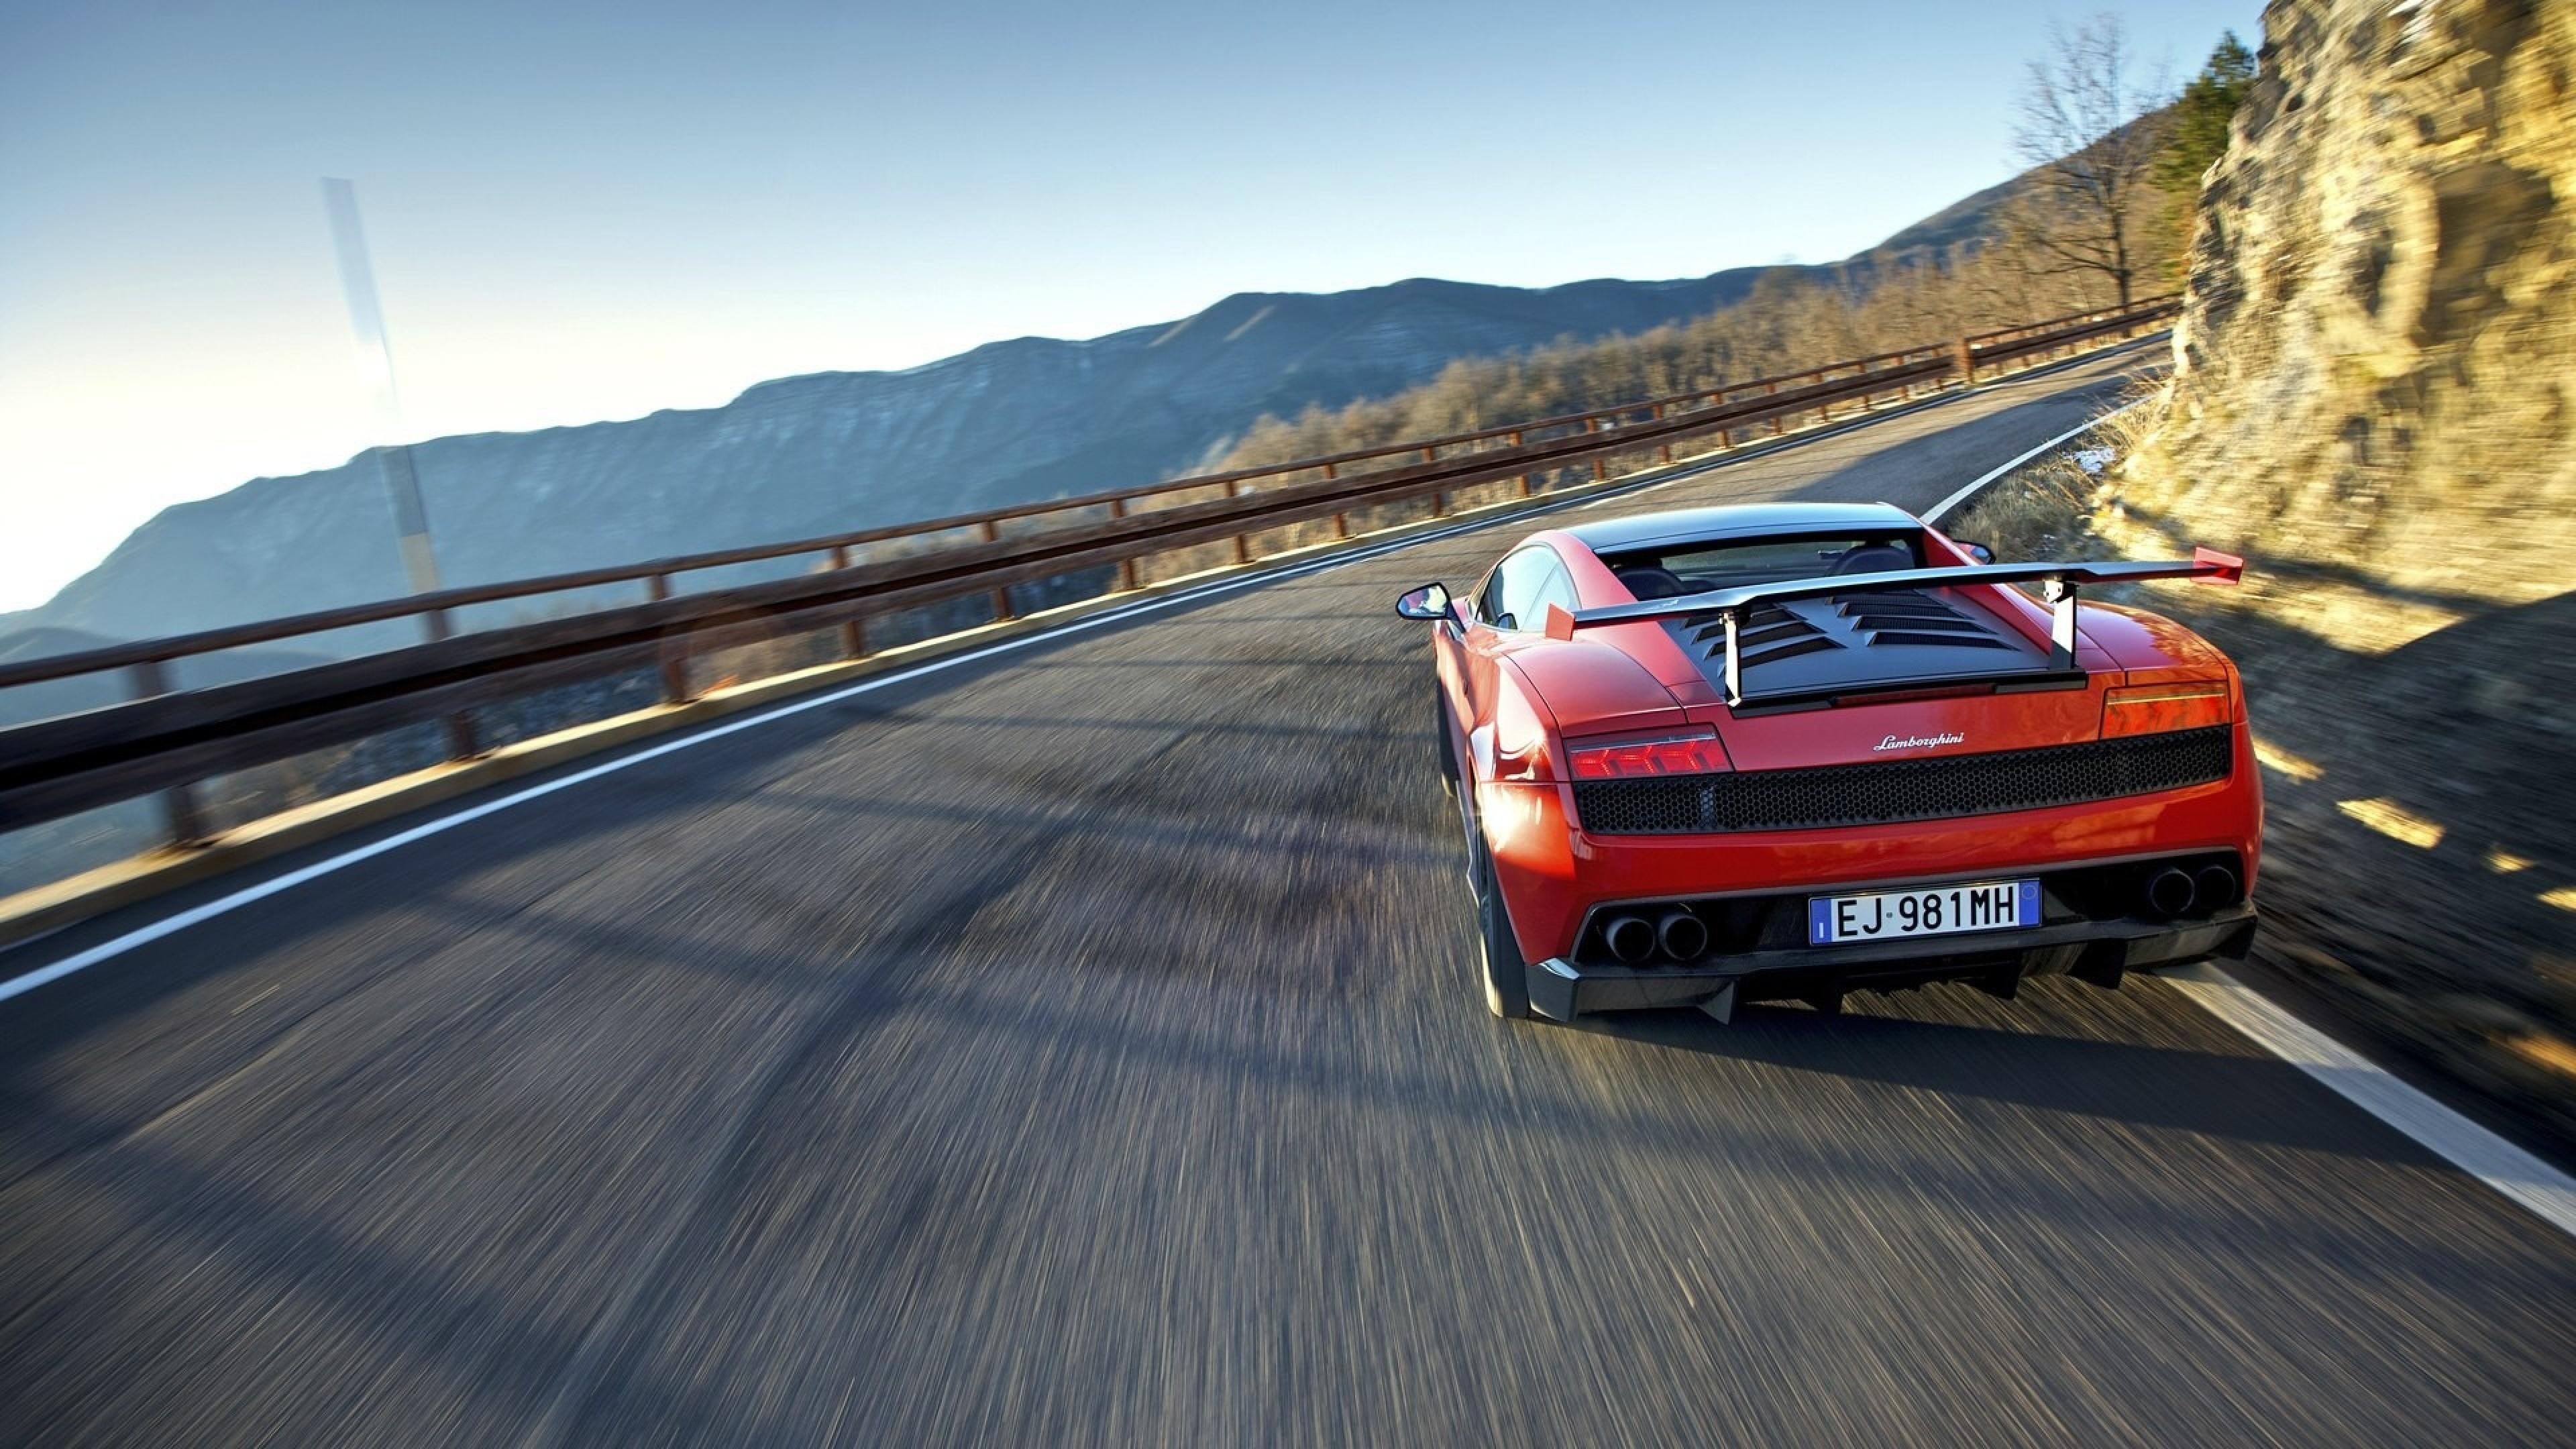 Super Sports Car Wallpaper | HD Car Wallpapers · 49 Speedy Car Wallpapers  For Free Desktop Download .